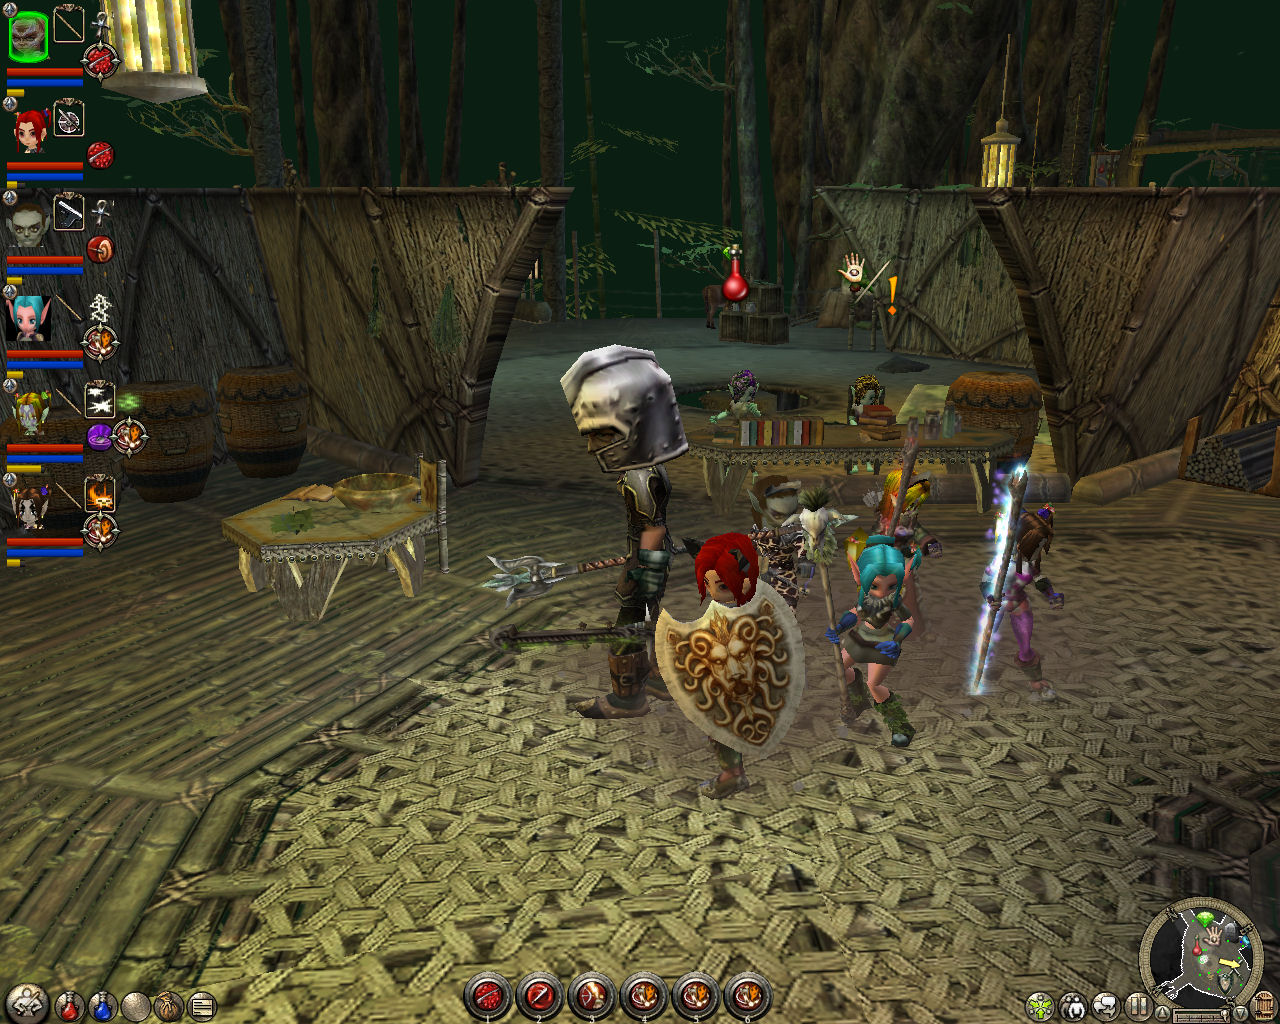 Скачать мод для dungeon siege 2